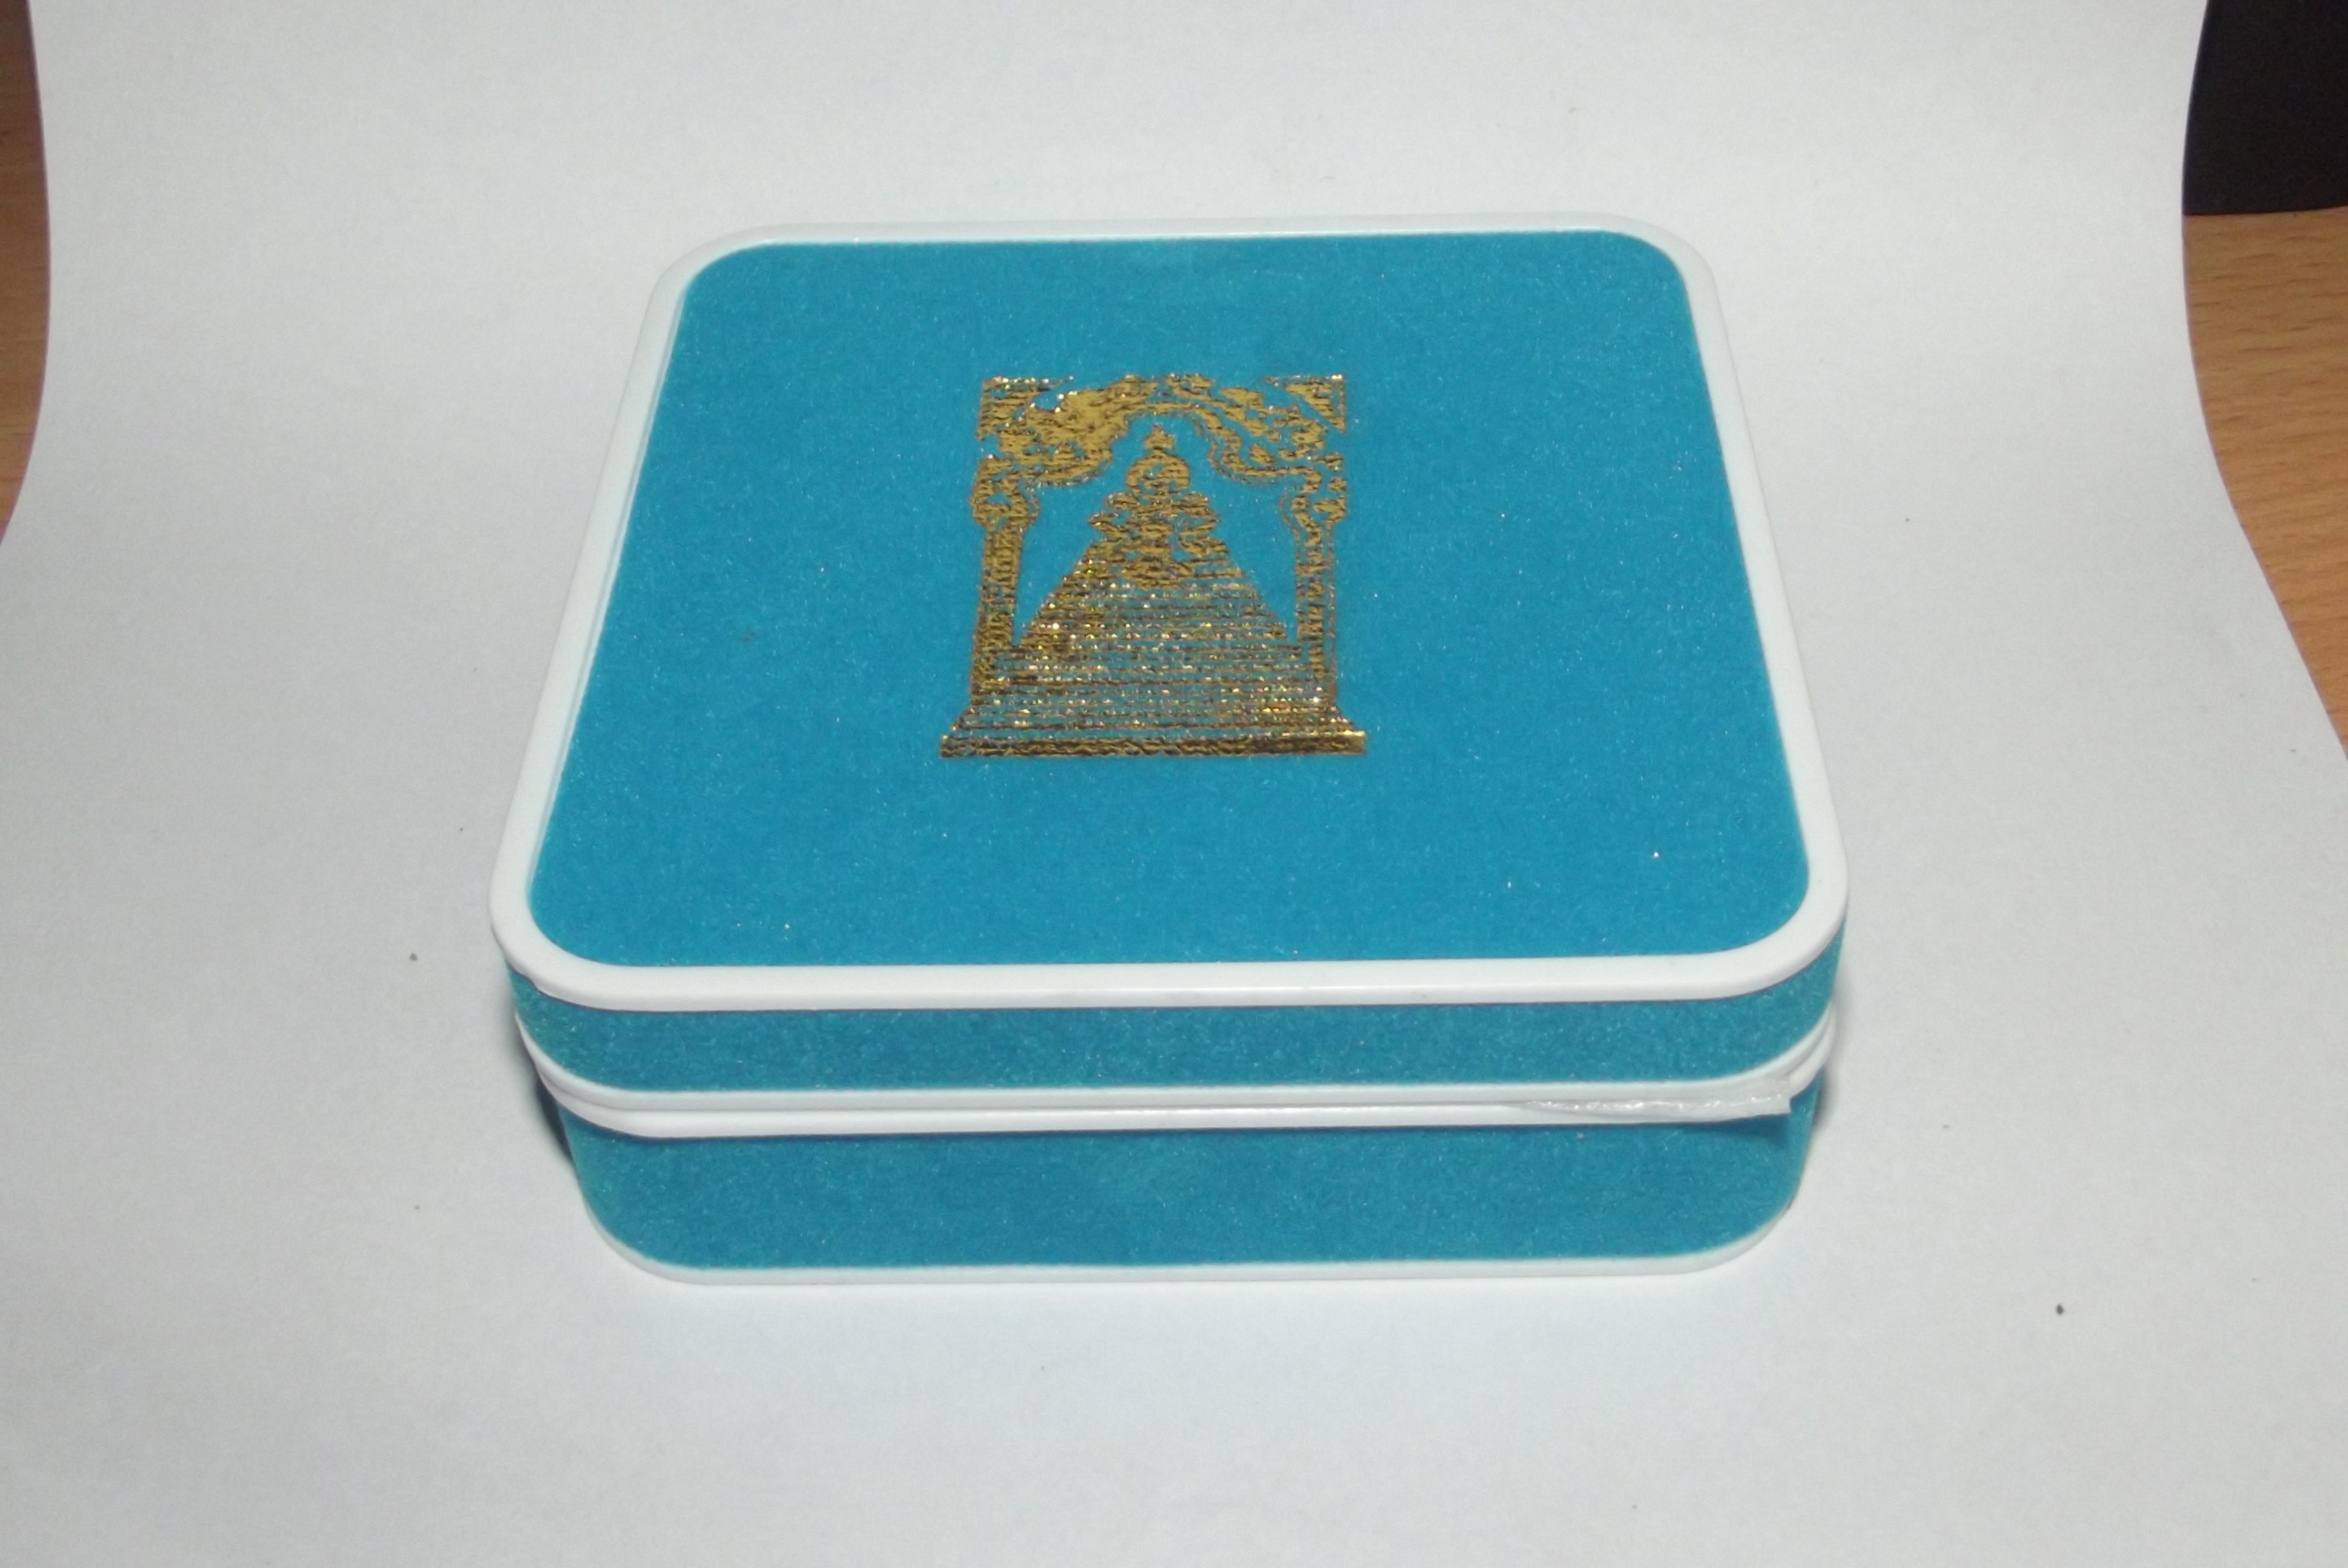 Pra Somdej Koo Bun Baramee Sethee Dtor Ngern Dtor Tong - Gao Maha Mongkol Edition - 2 Amulet Box Set - Temple of the Dawn 2554 BE